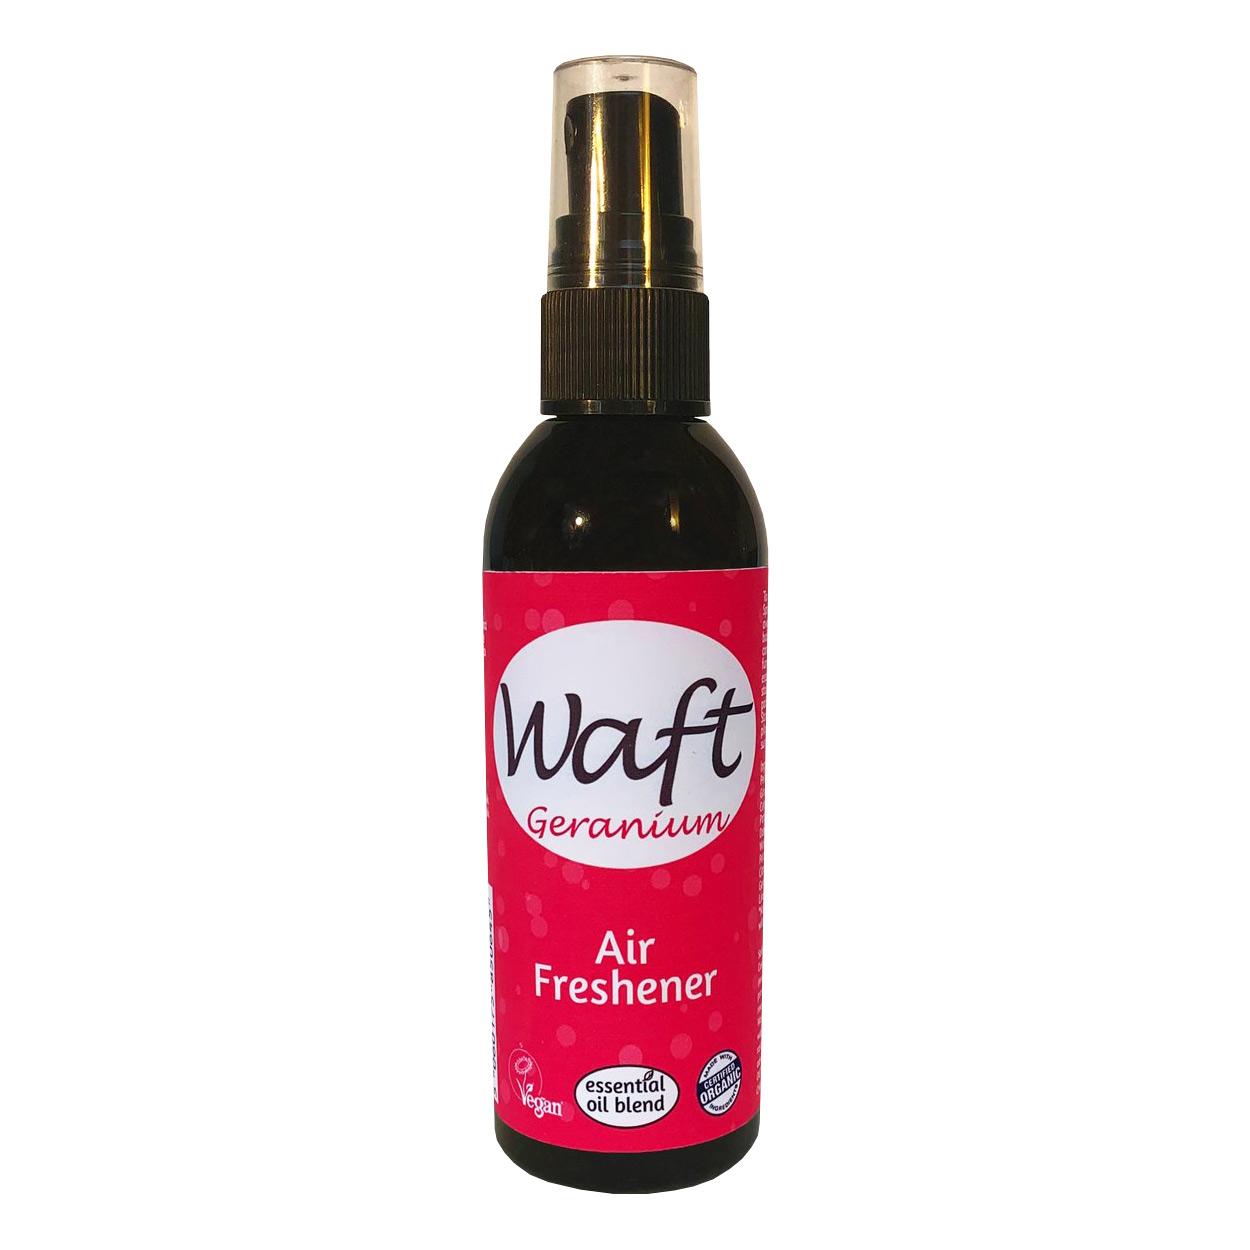 Waft Geranium Room Air Freshener - 100ml